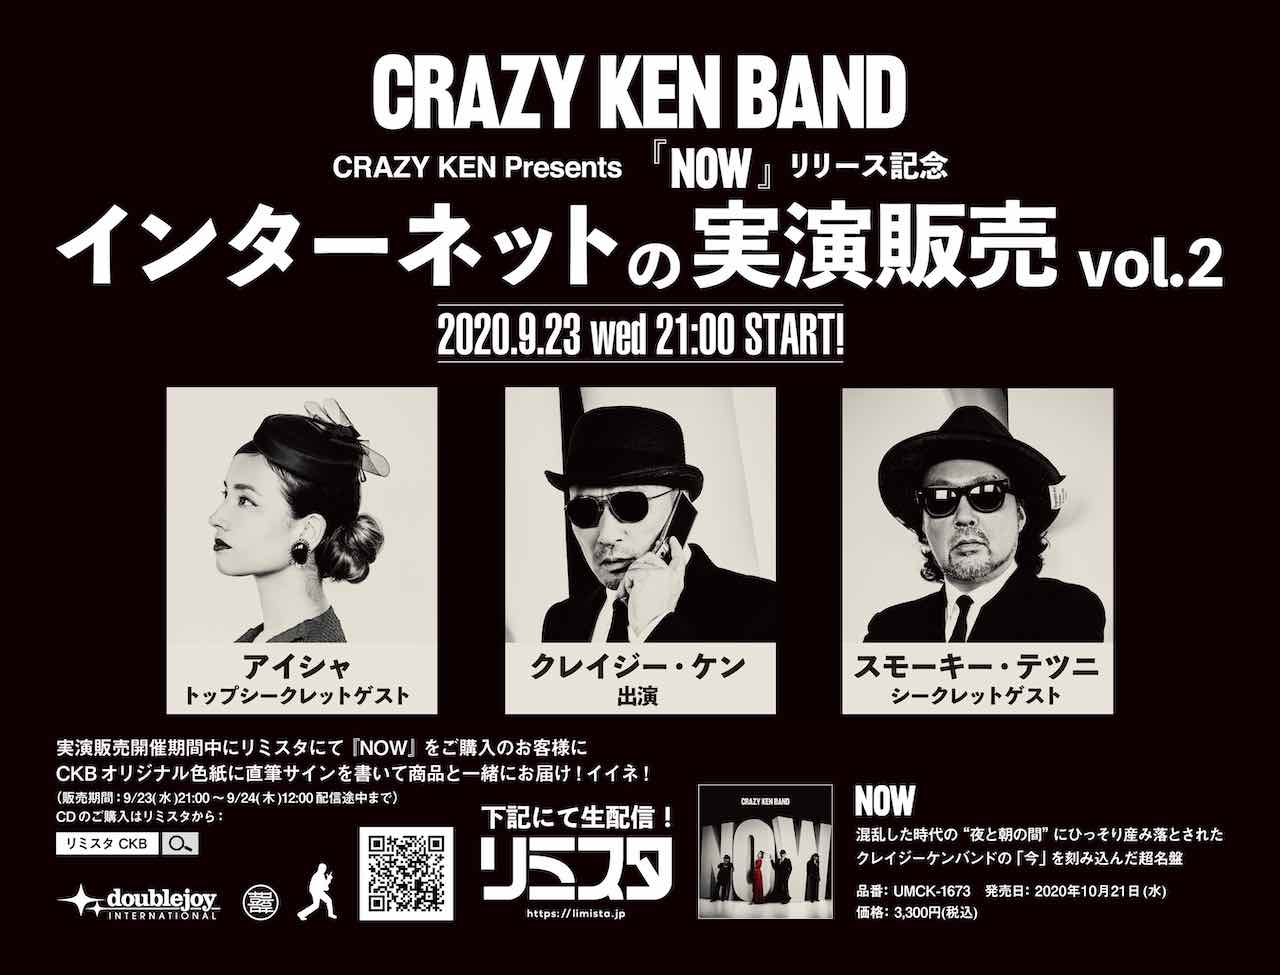 CRAZY KEN BAND、インターネットの実演販売 vol.2 開催決定!